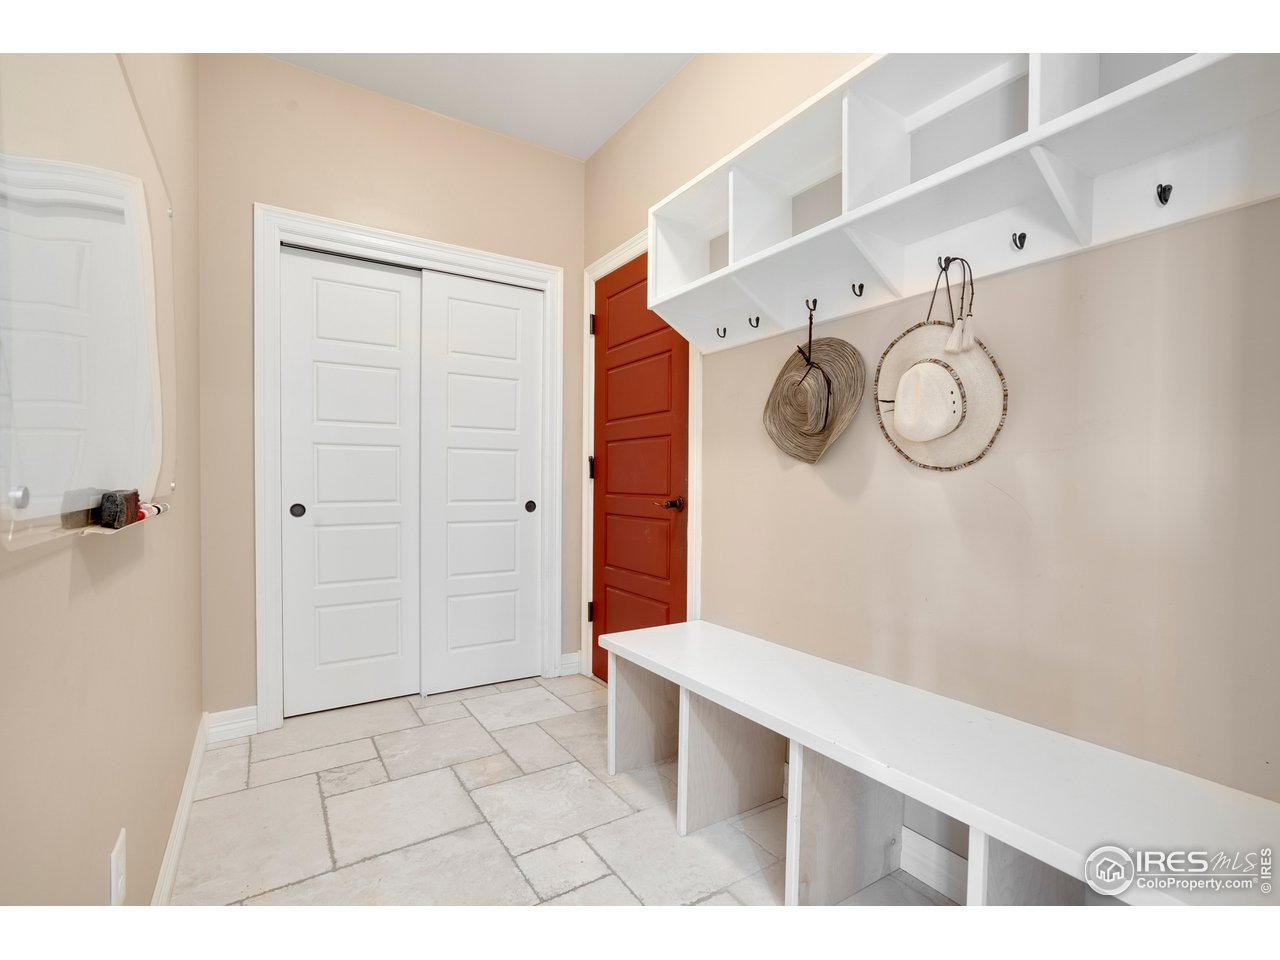 Mudroom with coat closet and service door  into garage